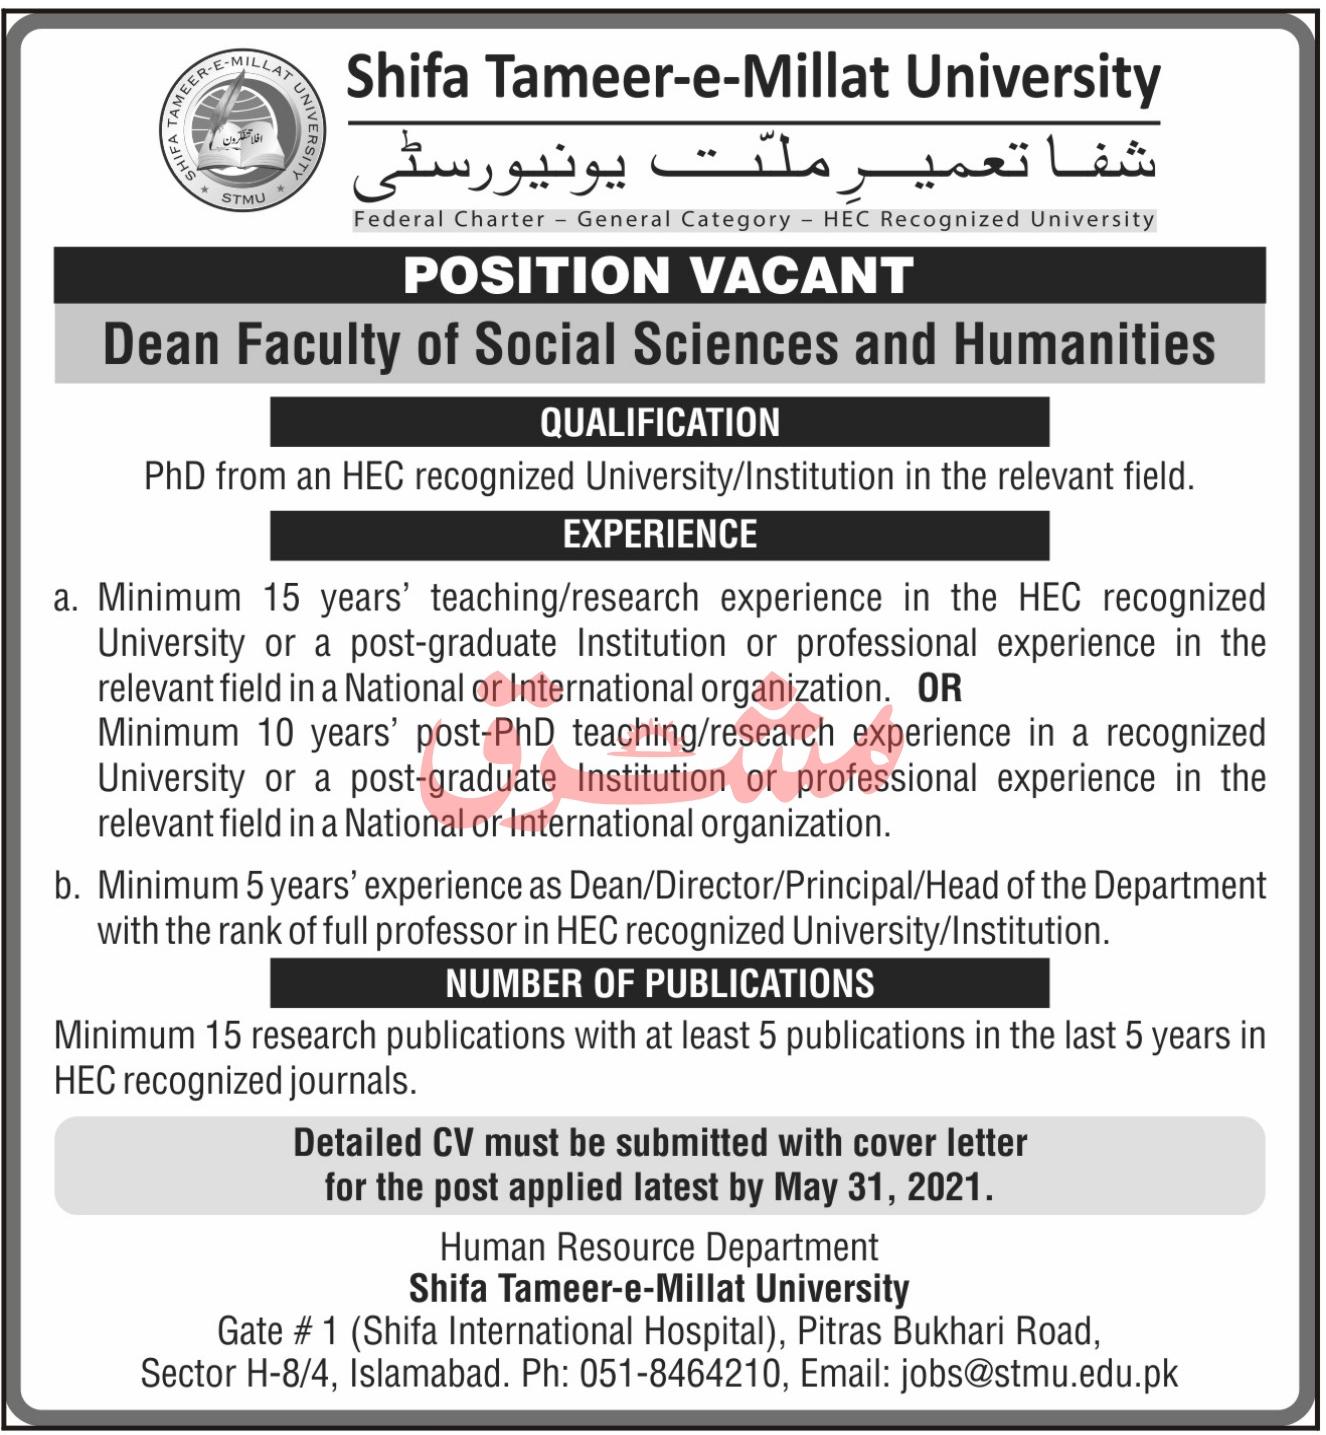 Shifa Tameer E Millat University Jobs 2021 in Pakistan